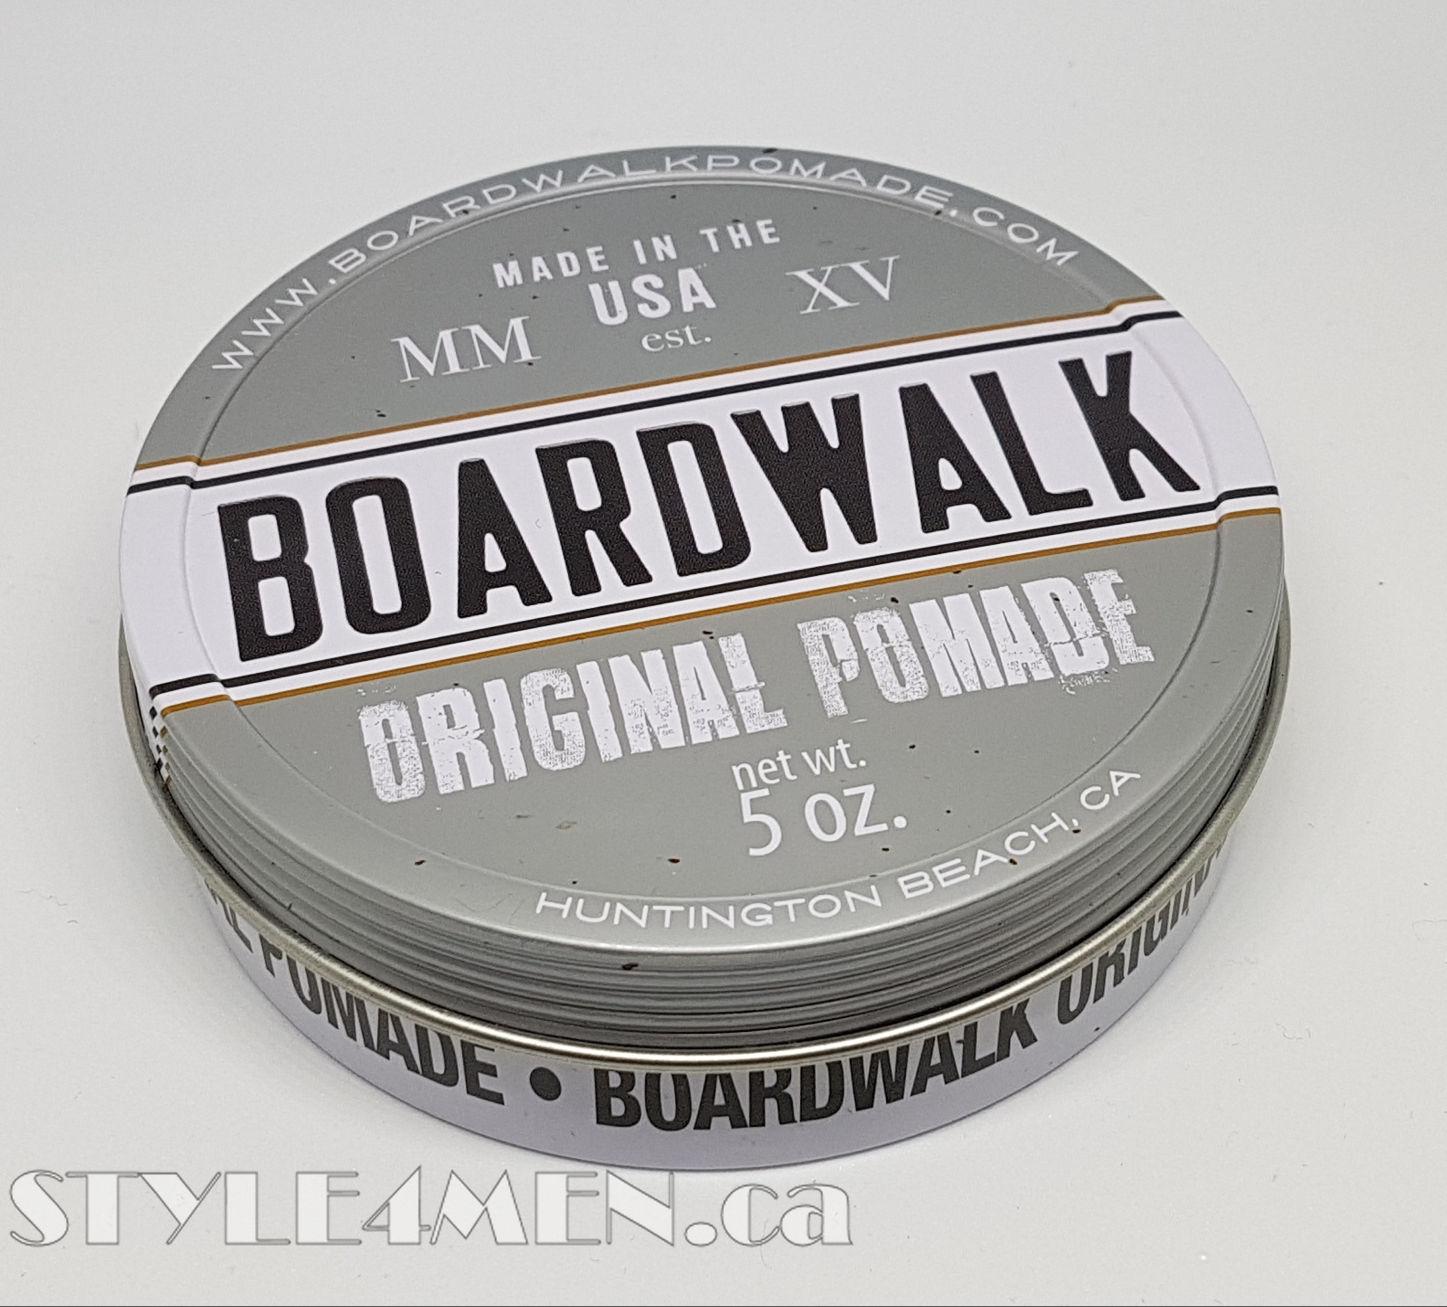 Boardwalk Original Pomade